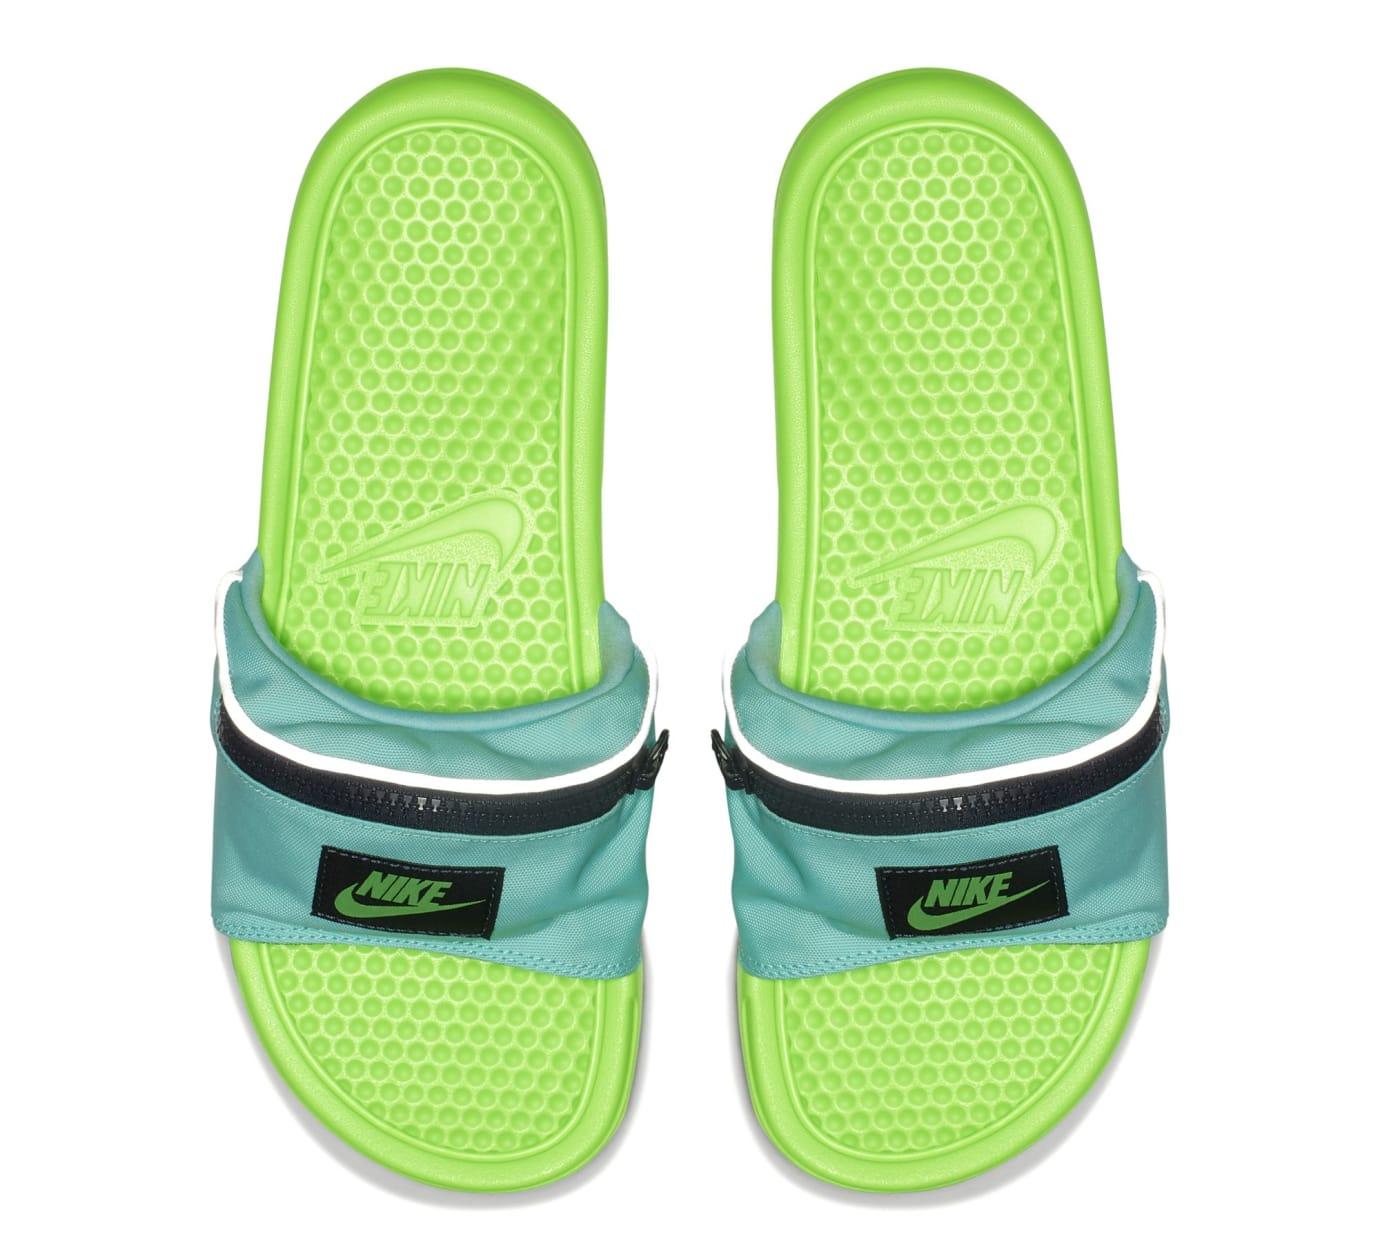 5812f6045445 Image via Nike US11 · Nike Benassi JDI  Fanny Pack  Green (Top)